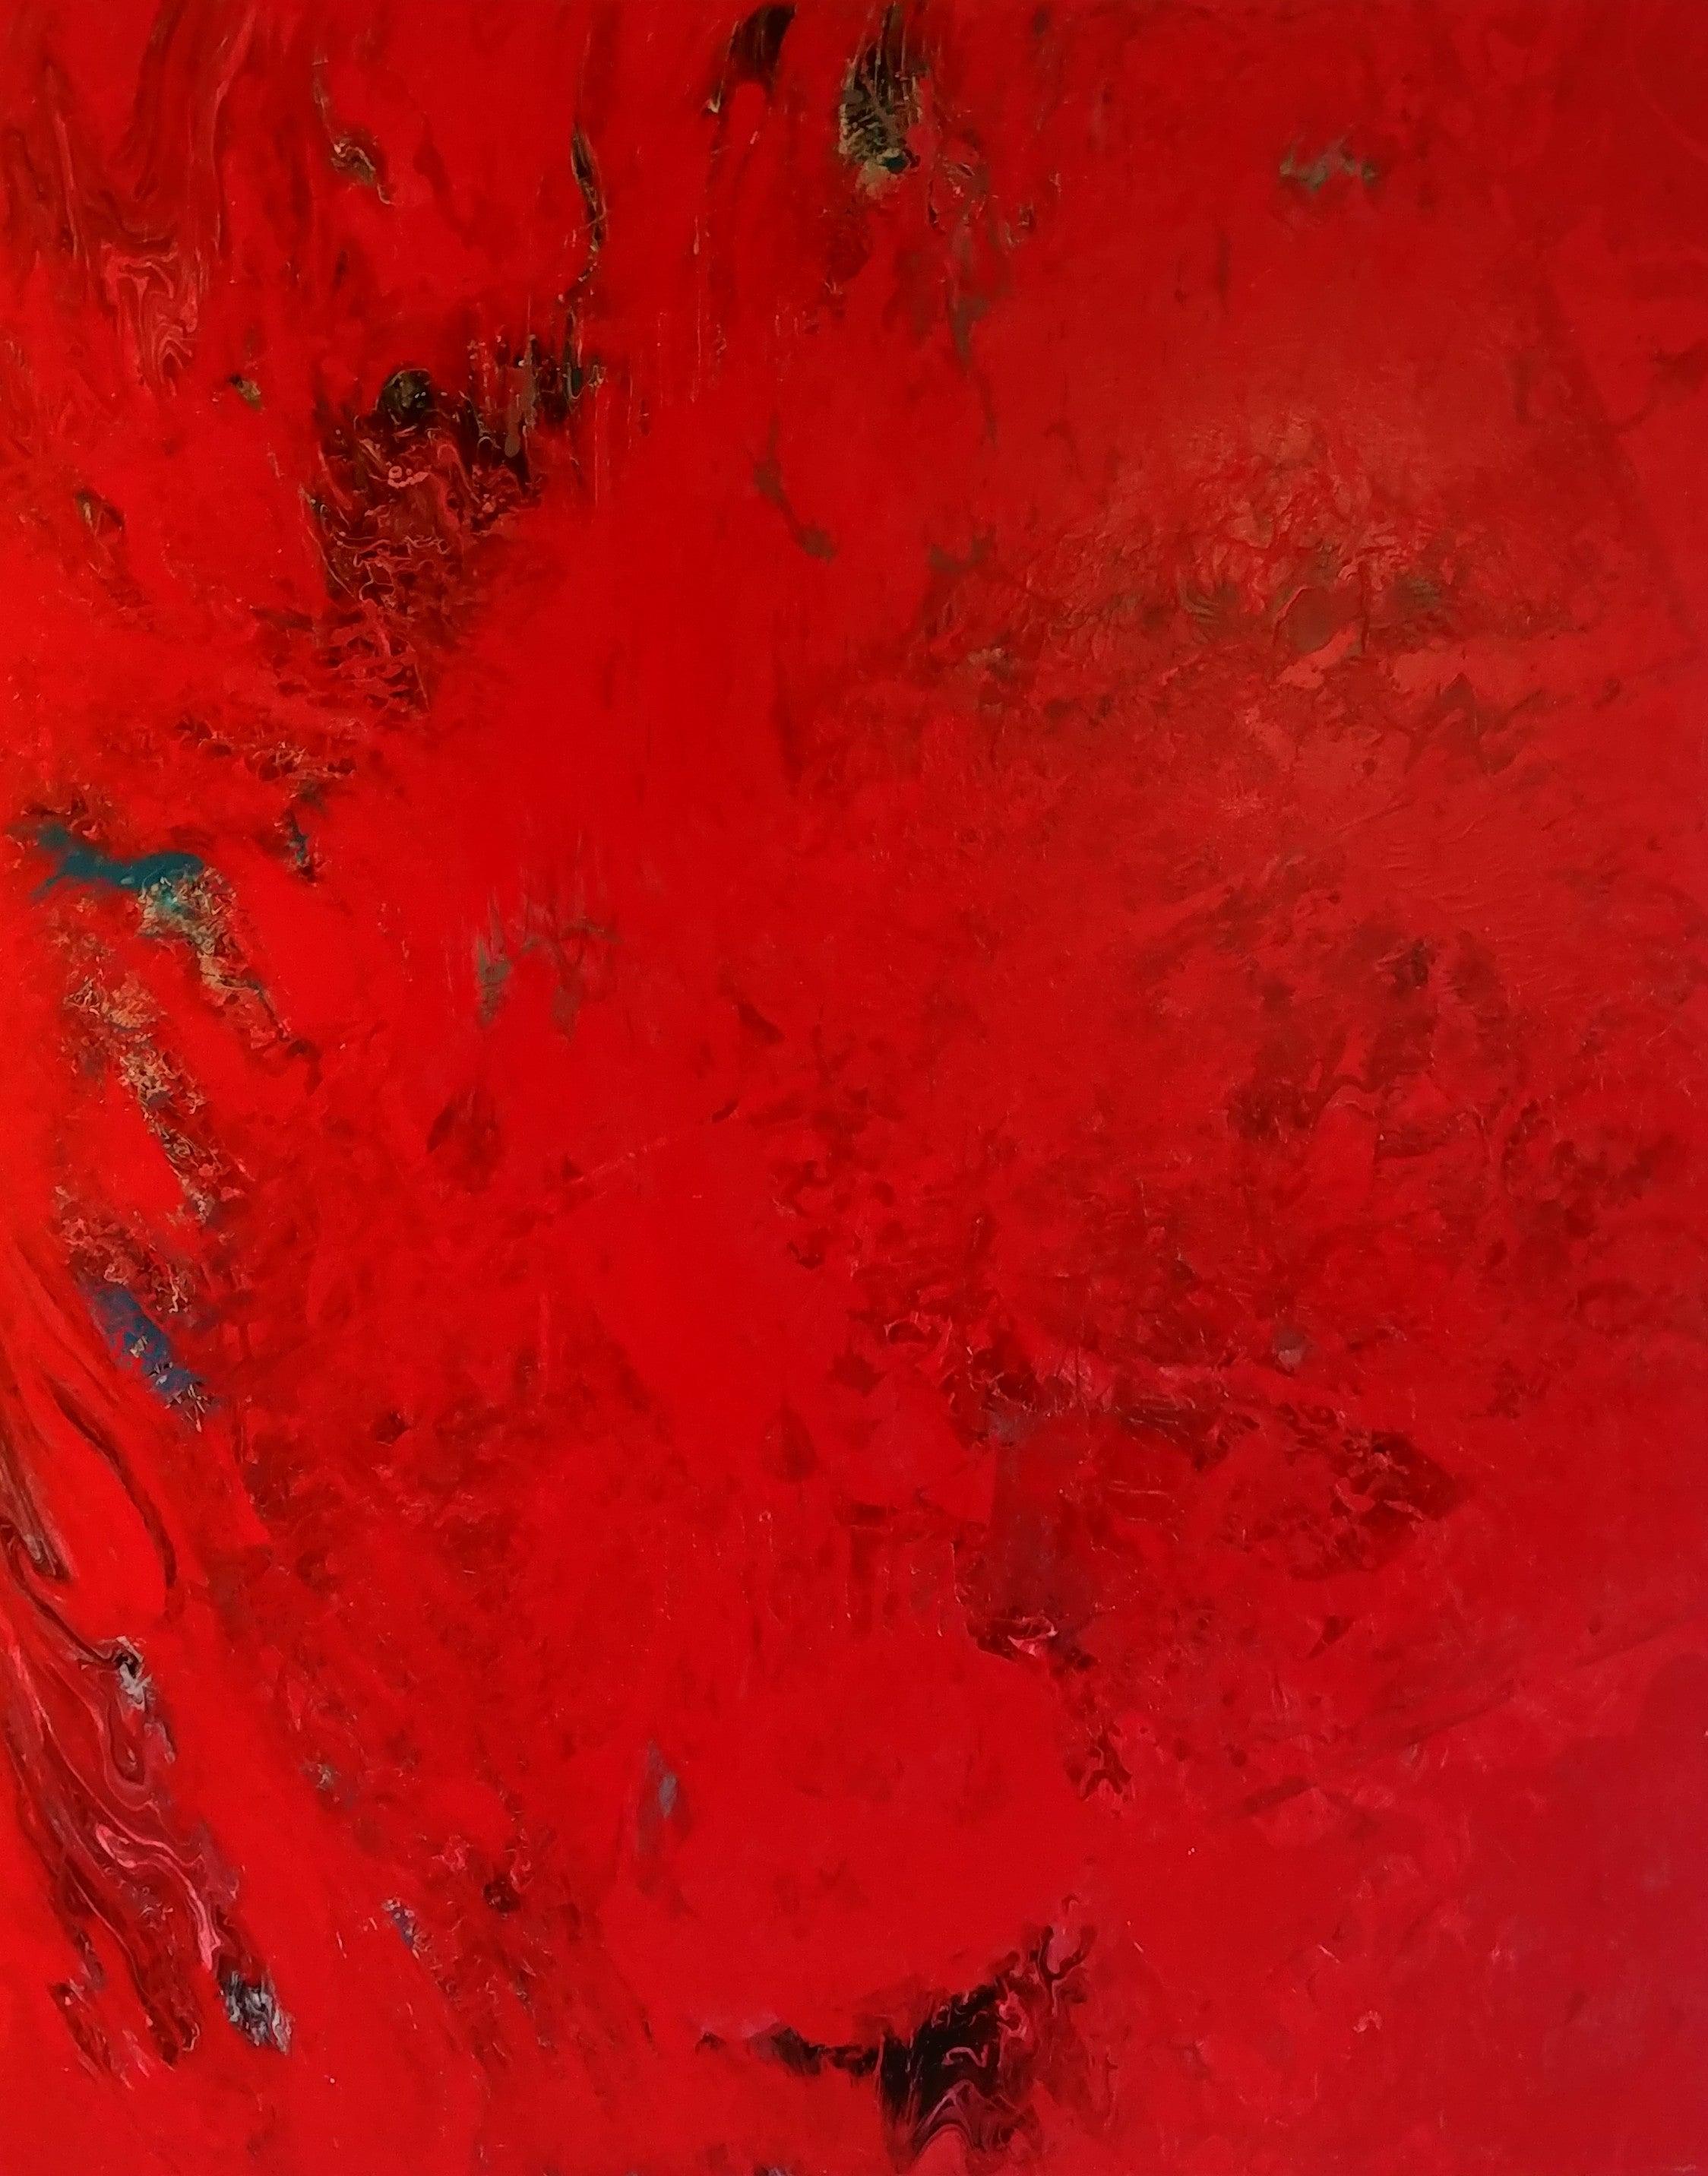 Bursting Forth-Red 60 X 48